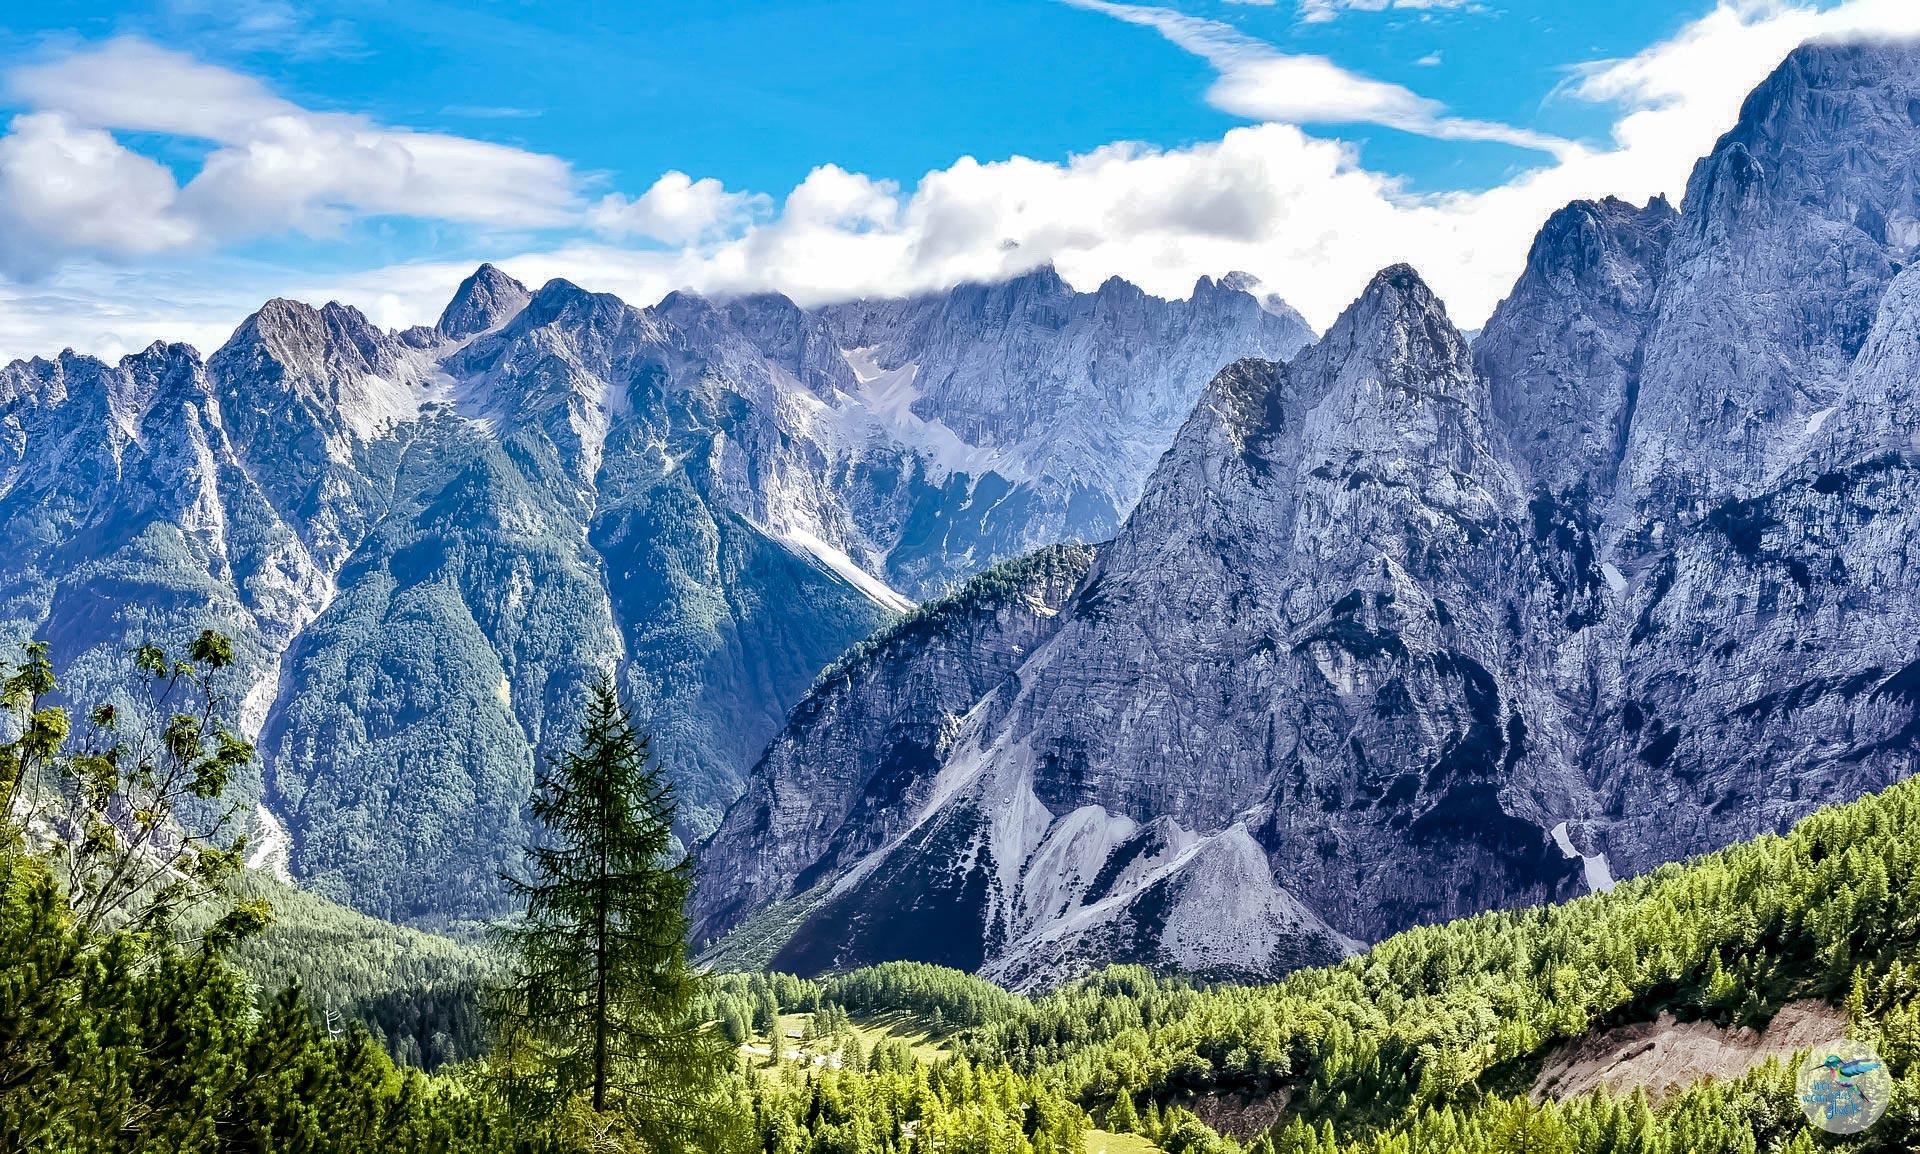 Alpe Adria Trail Etappe 23, Richtung Vršič-Pass